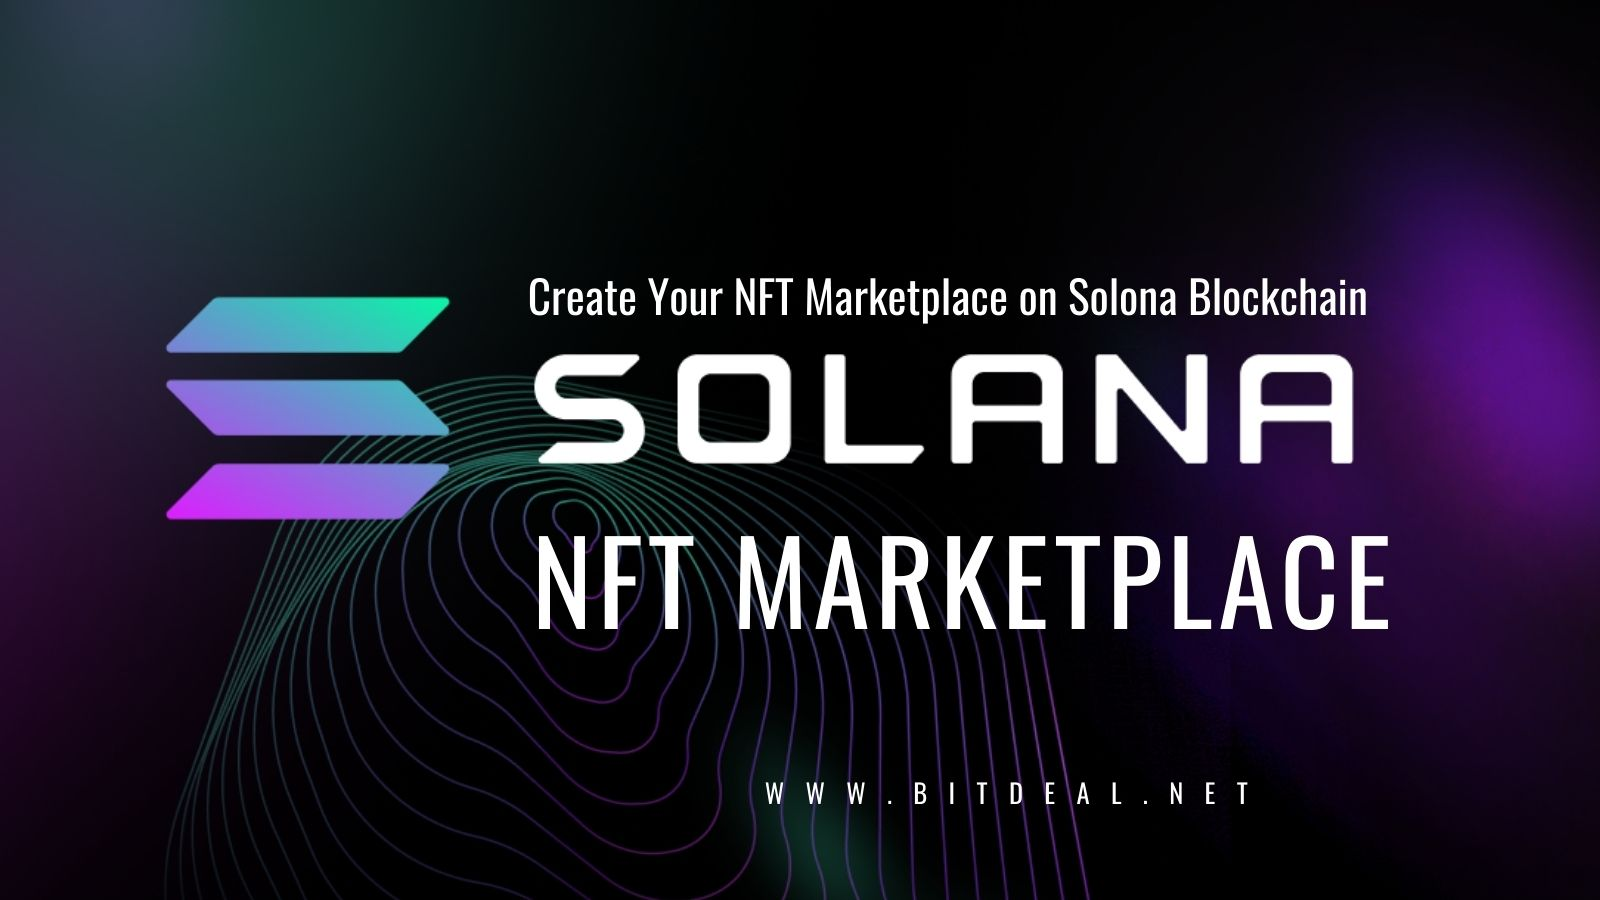 NFT Marketplace Development On Solana Blockchain